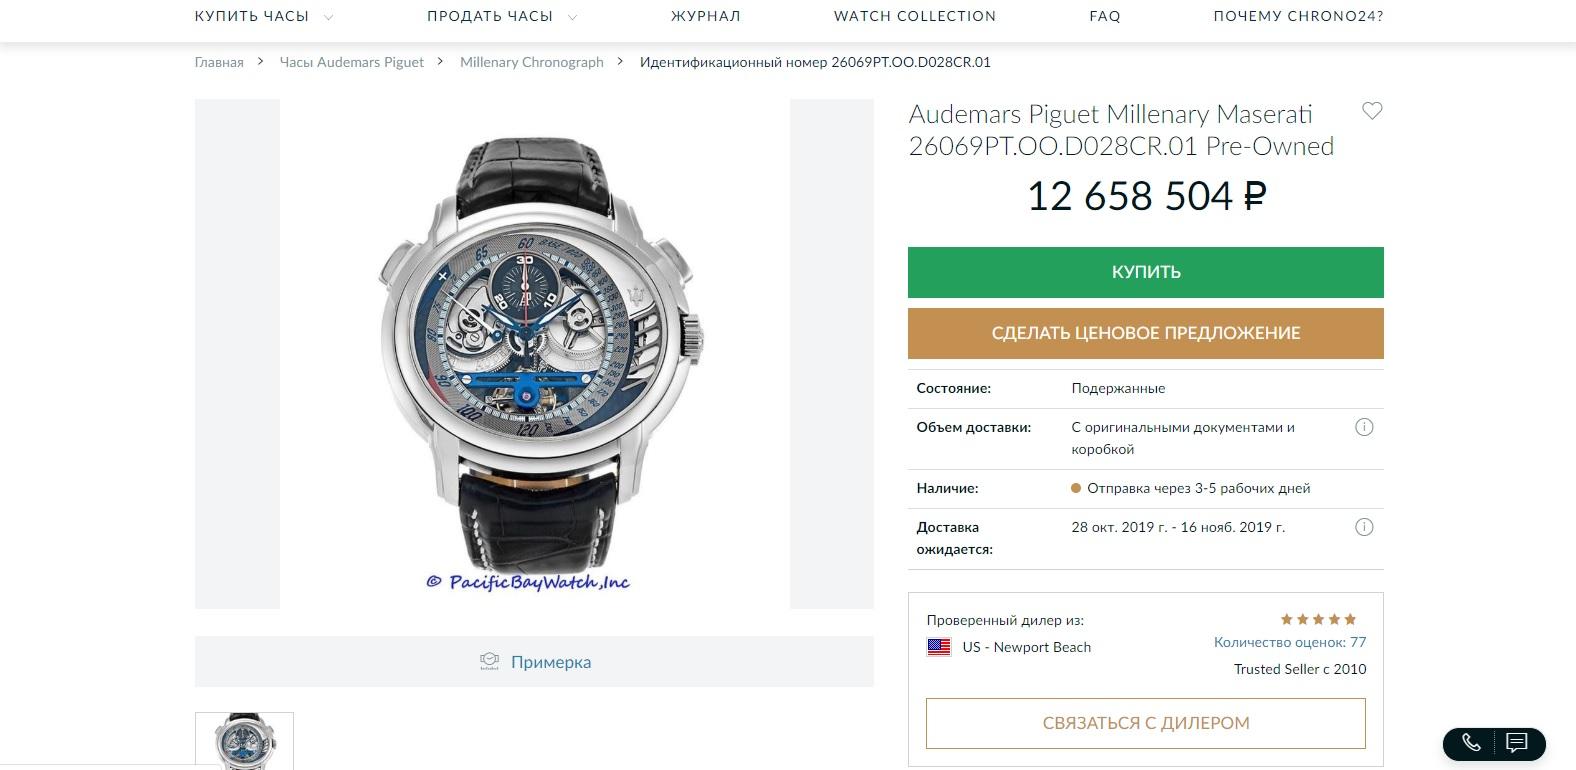 Audemars Piguet Millenary Maserati